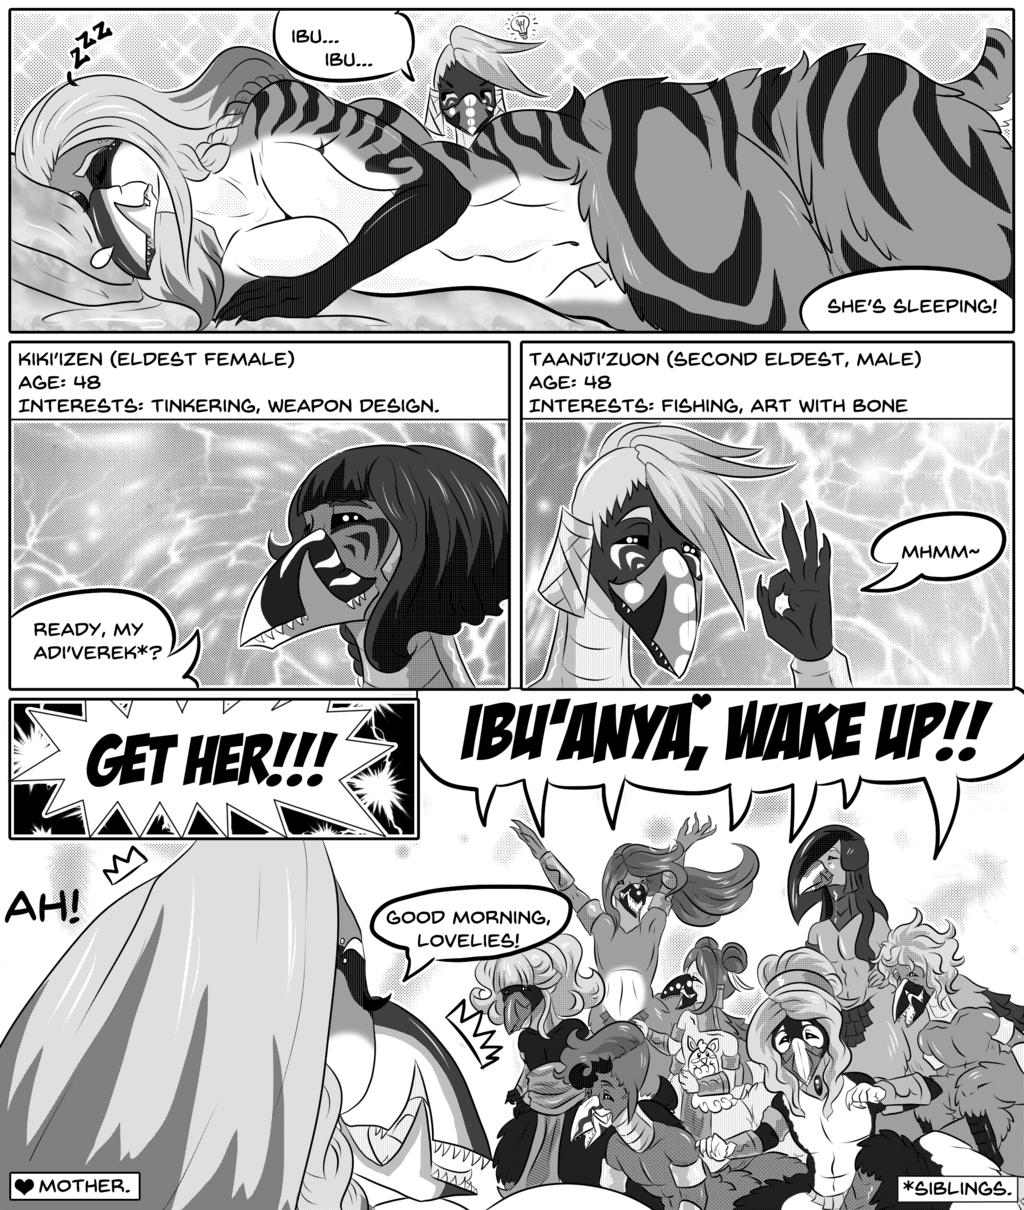 Calti-vating Mystique, Page 2